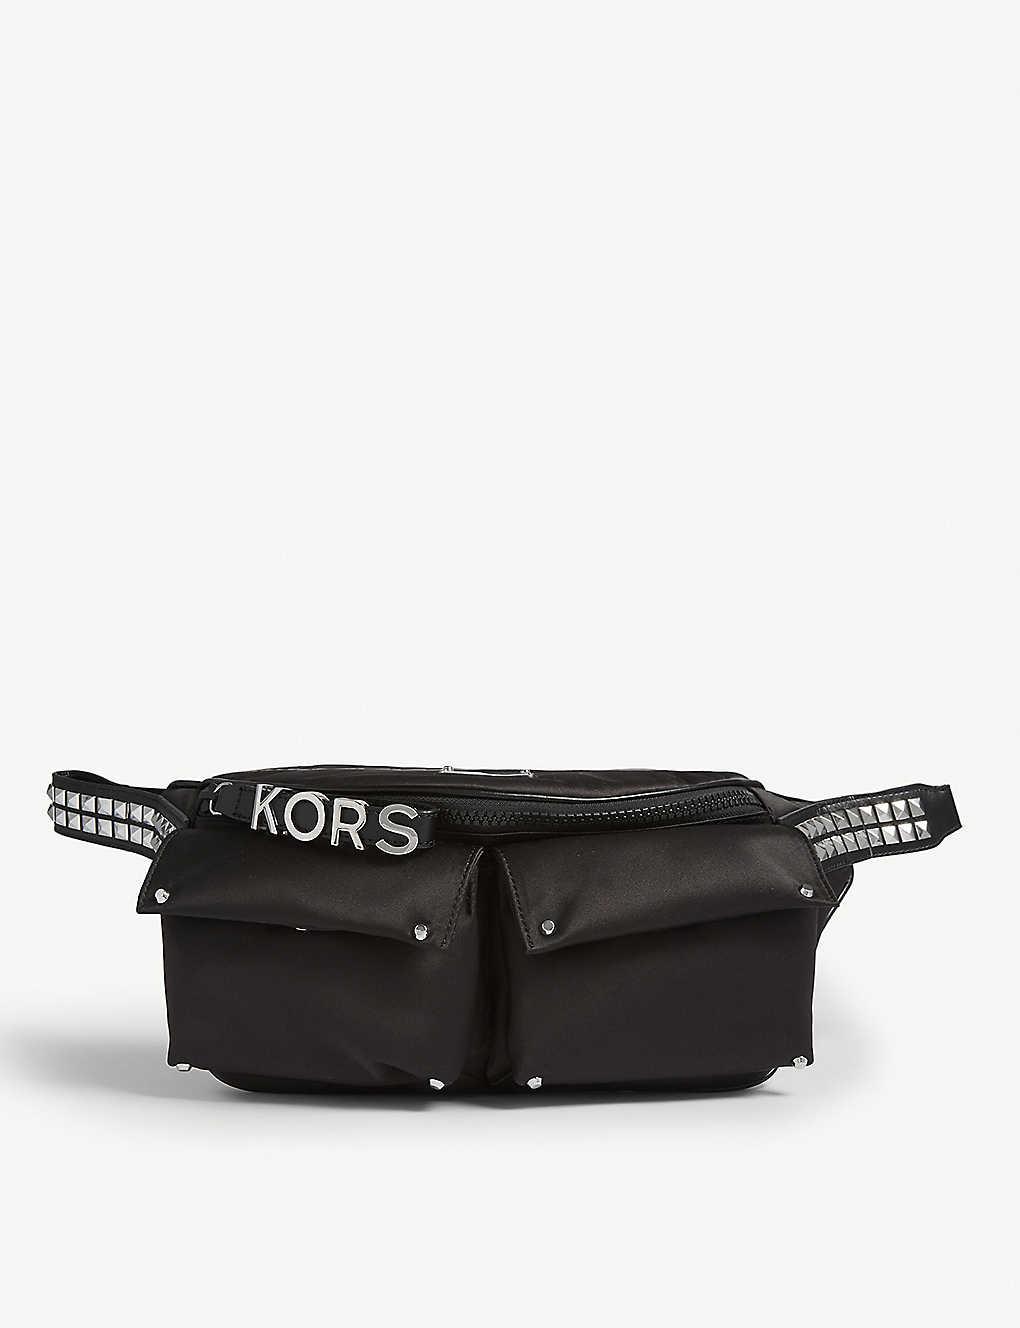 54c9b0dff9c8 MICHAEL MICHAEL KORS - Olivia studded nylon belt bag | Selfridges.com